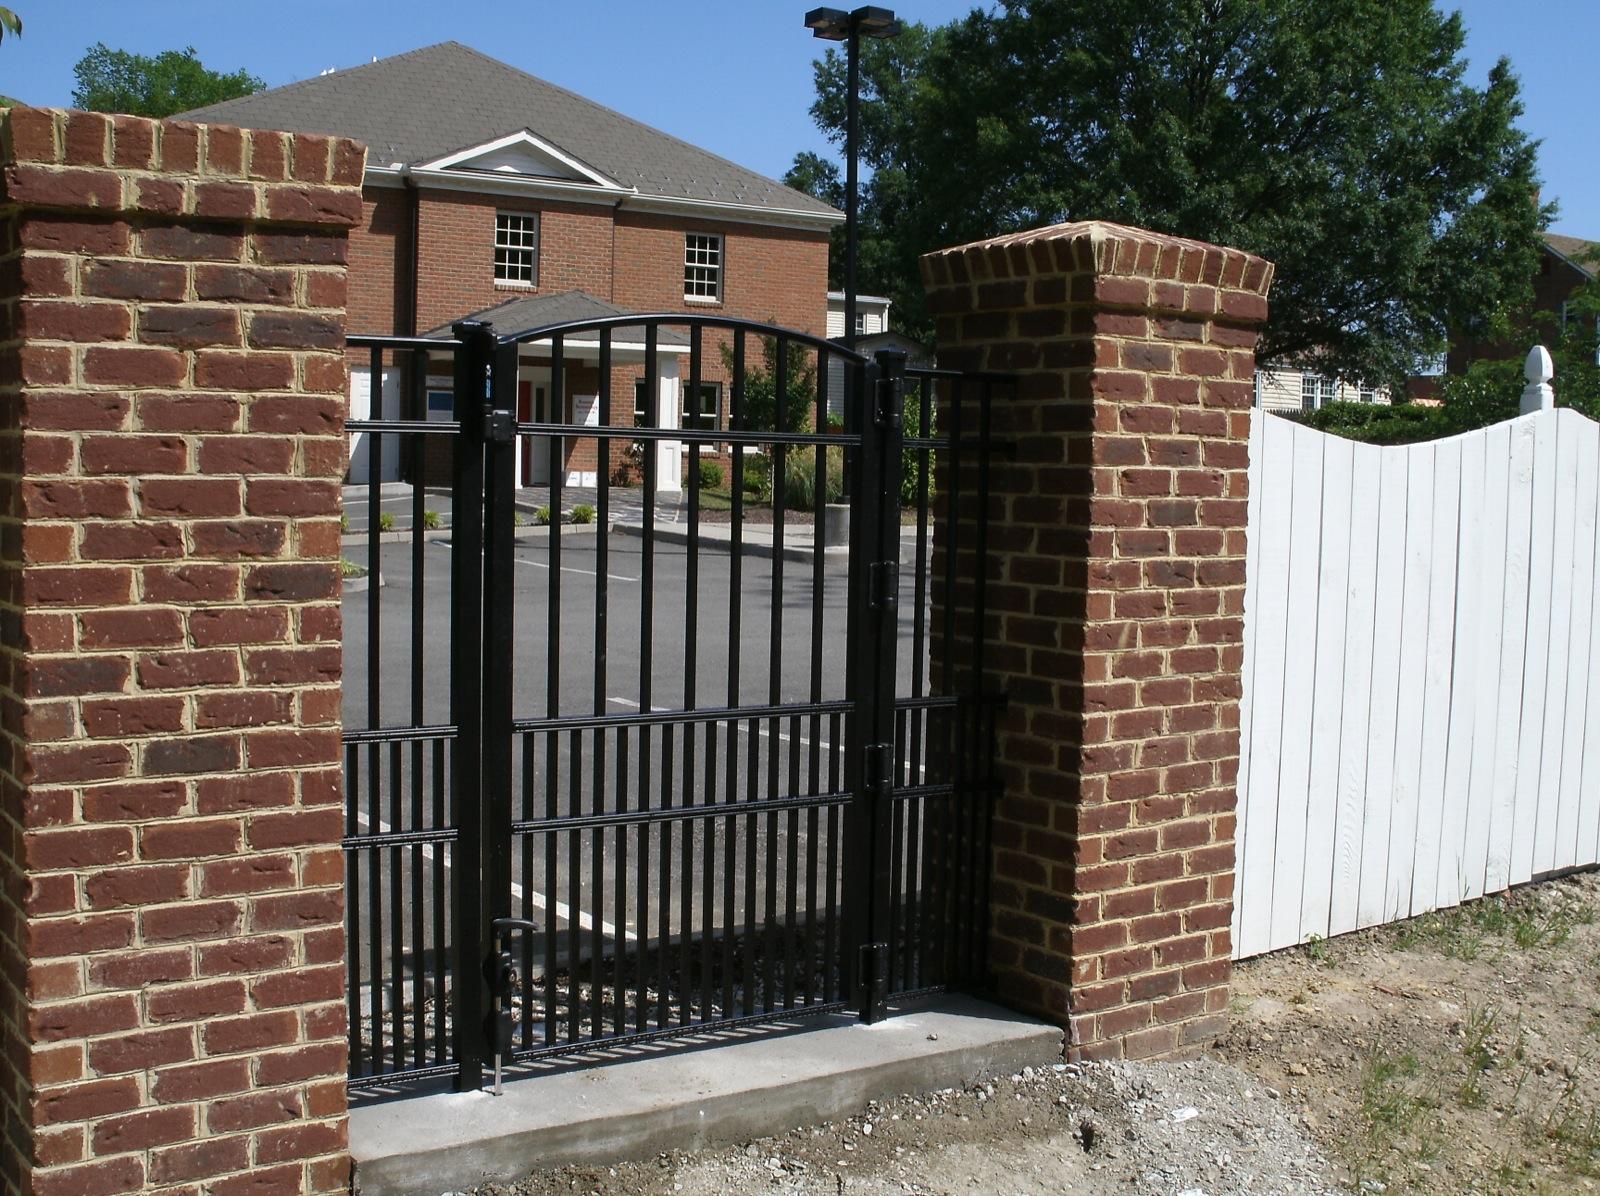 Walk Gates - Small gates typically 3-6' wide